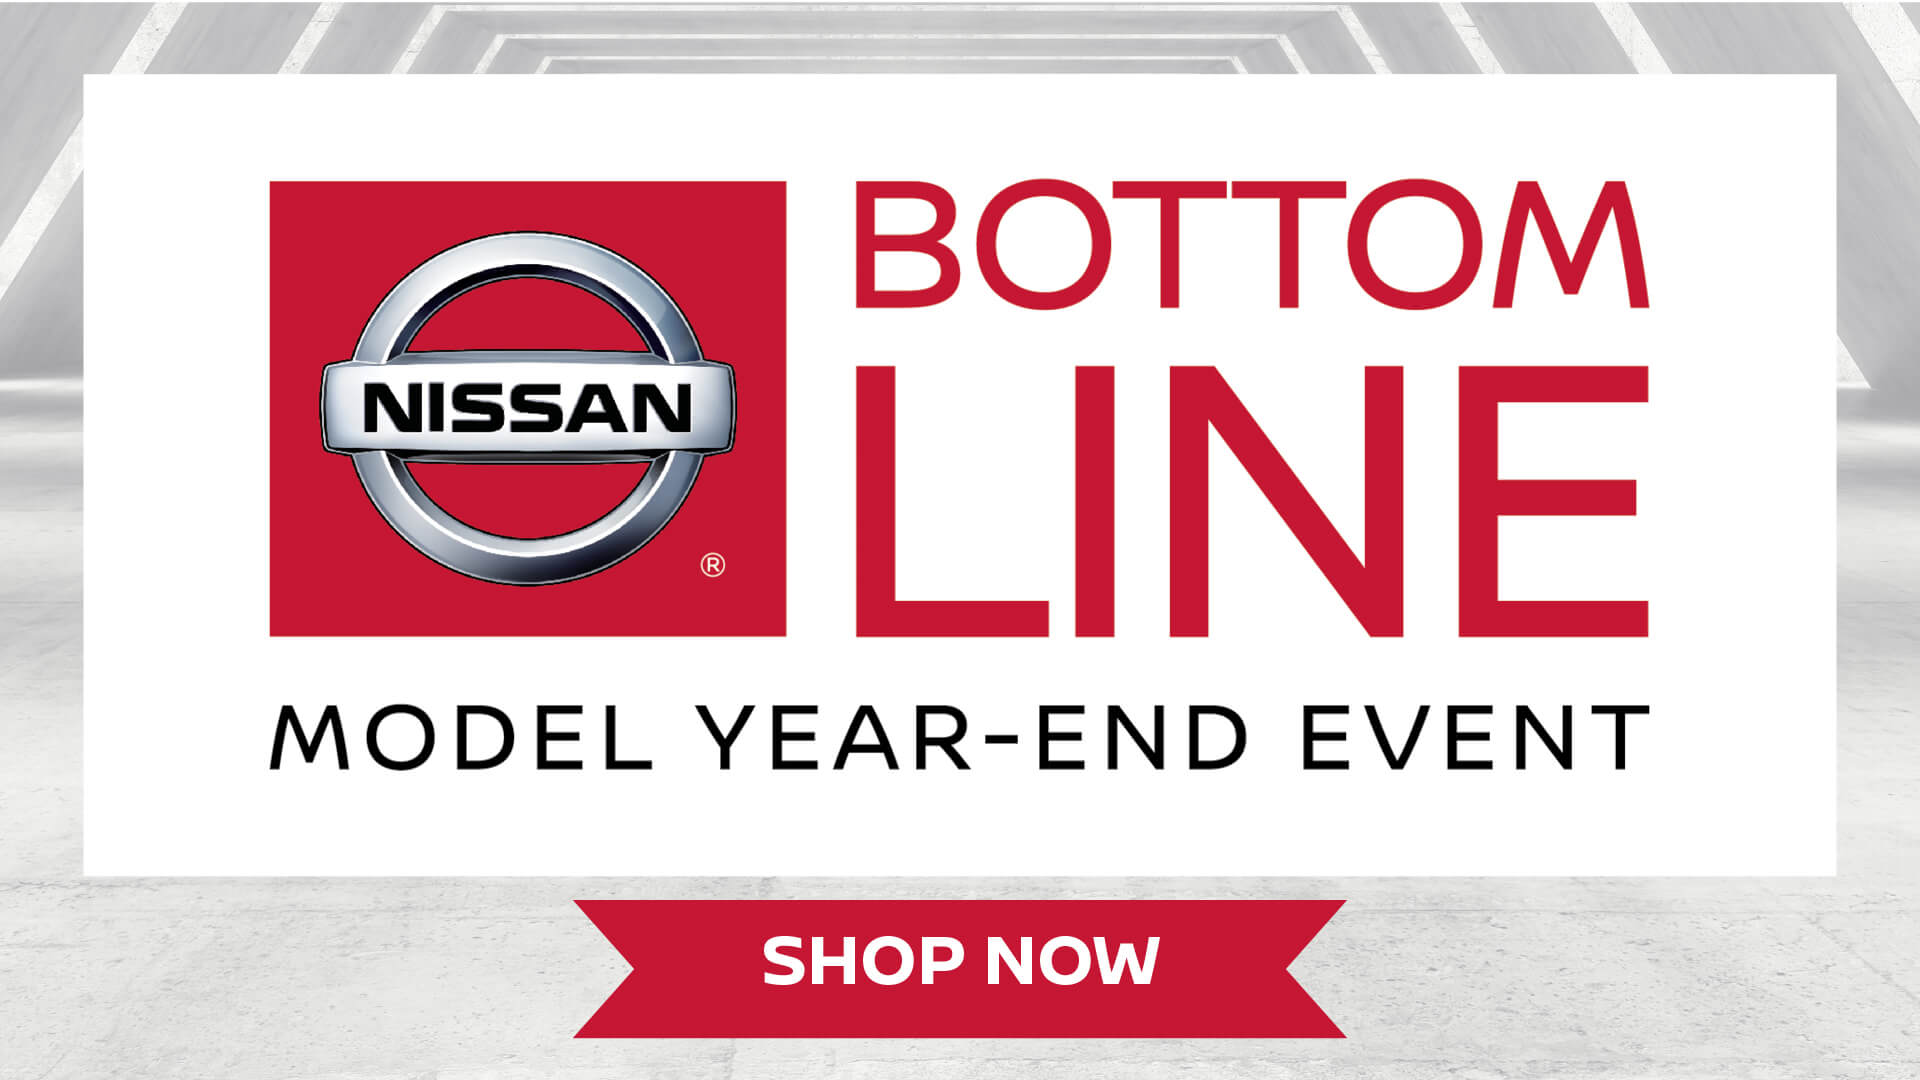 Nissan Bottom Line Model Year-End Event